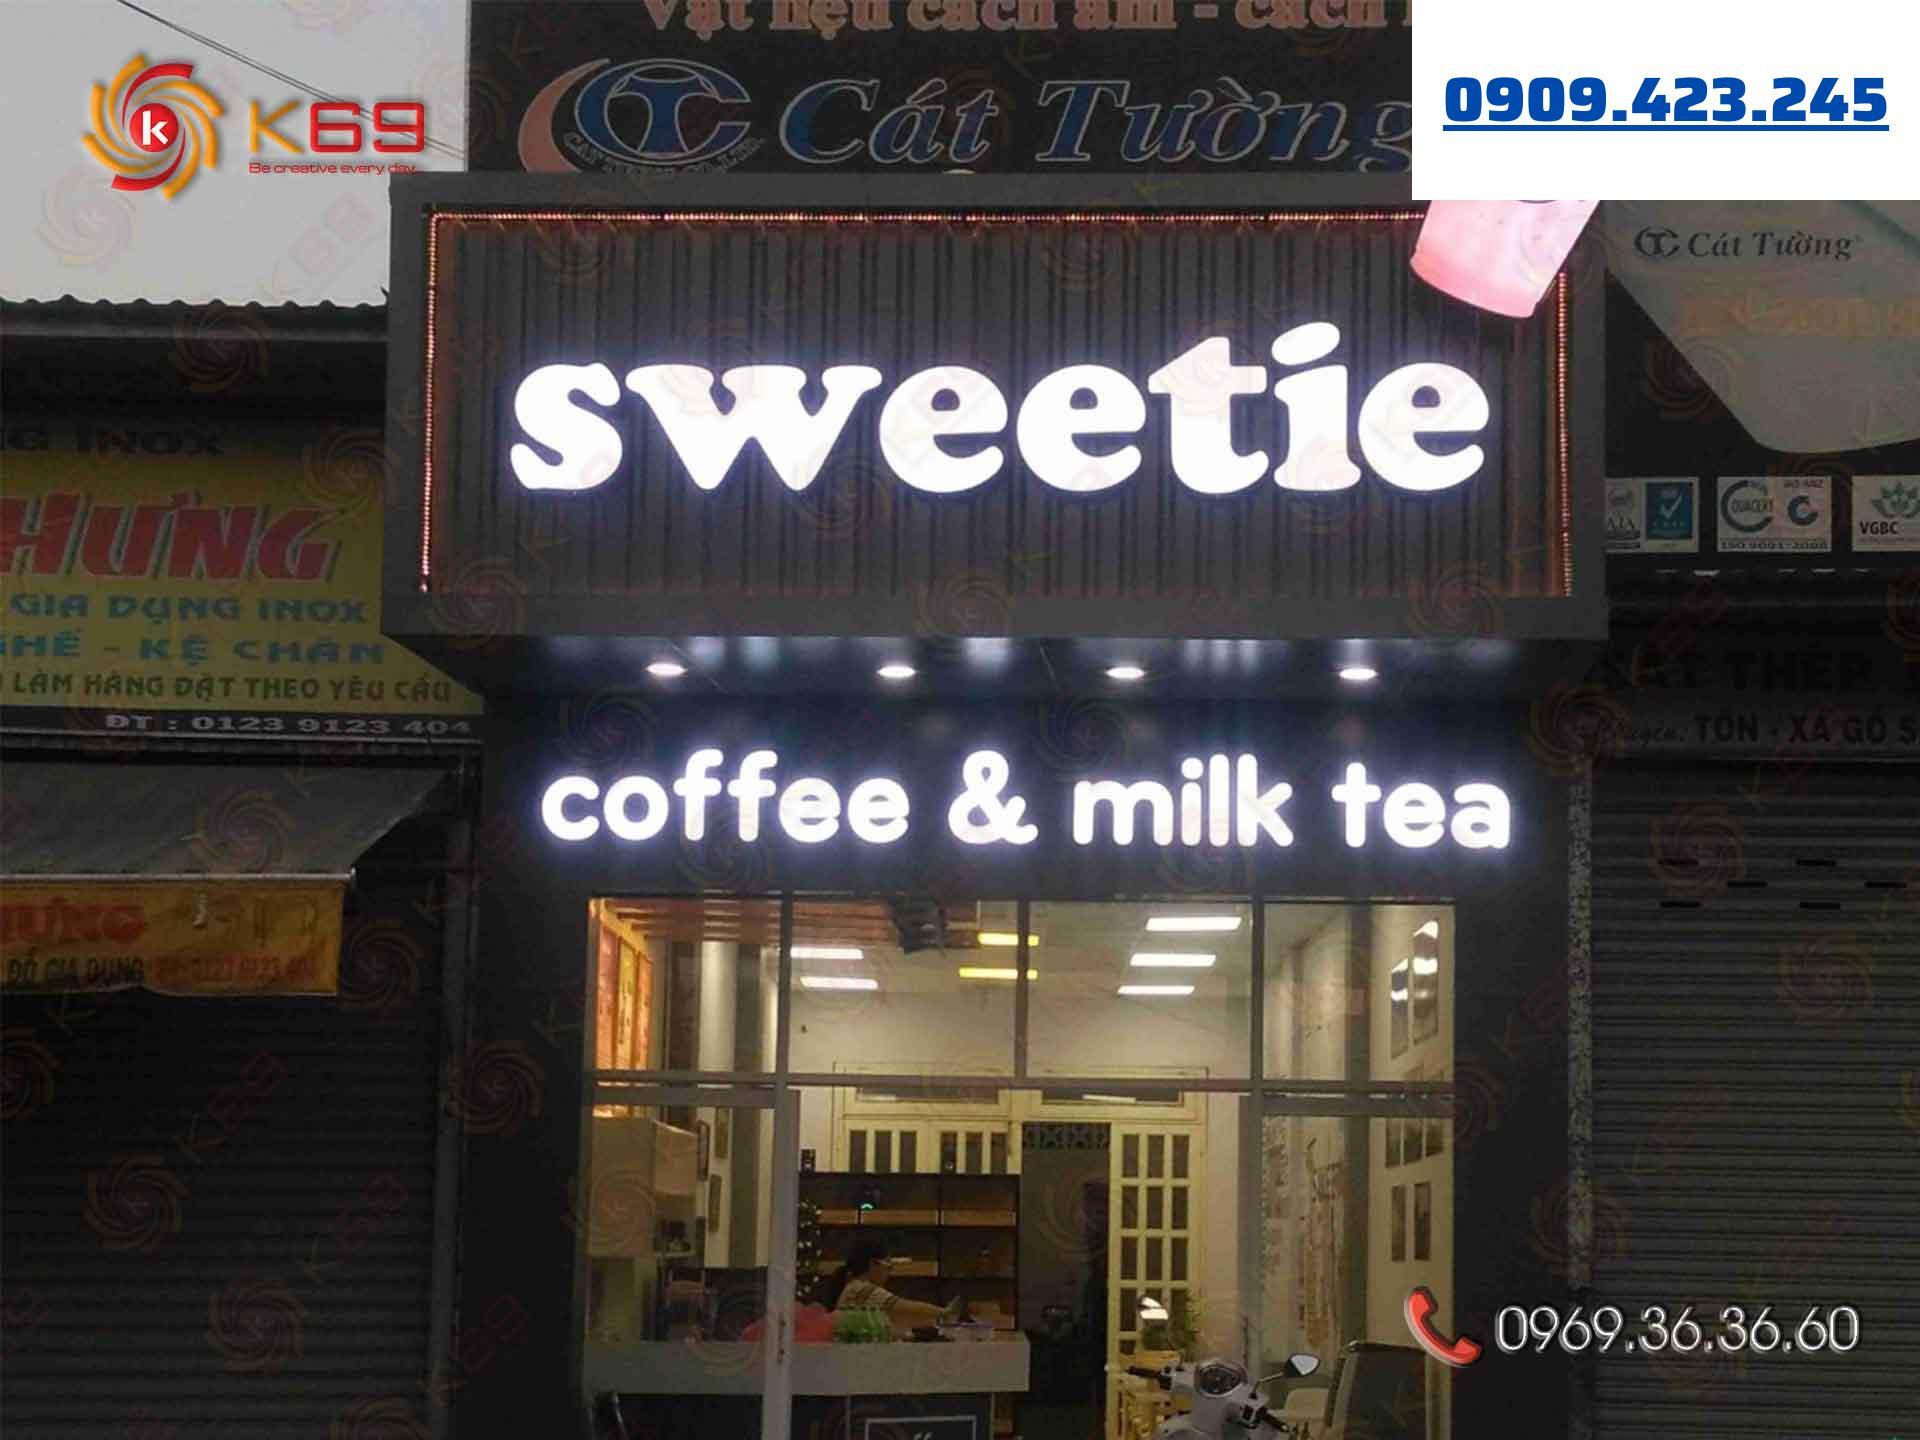 Mẫu bảng hiệu trà sữa Sweetie đẹp tại K69adv